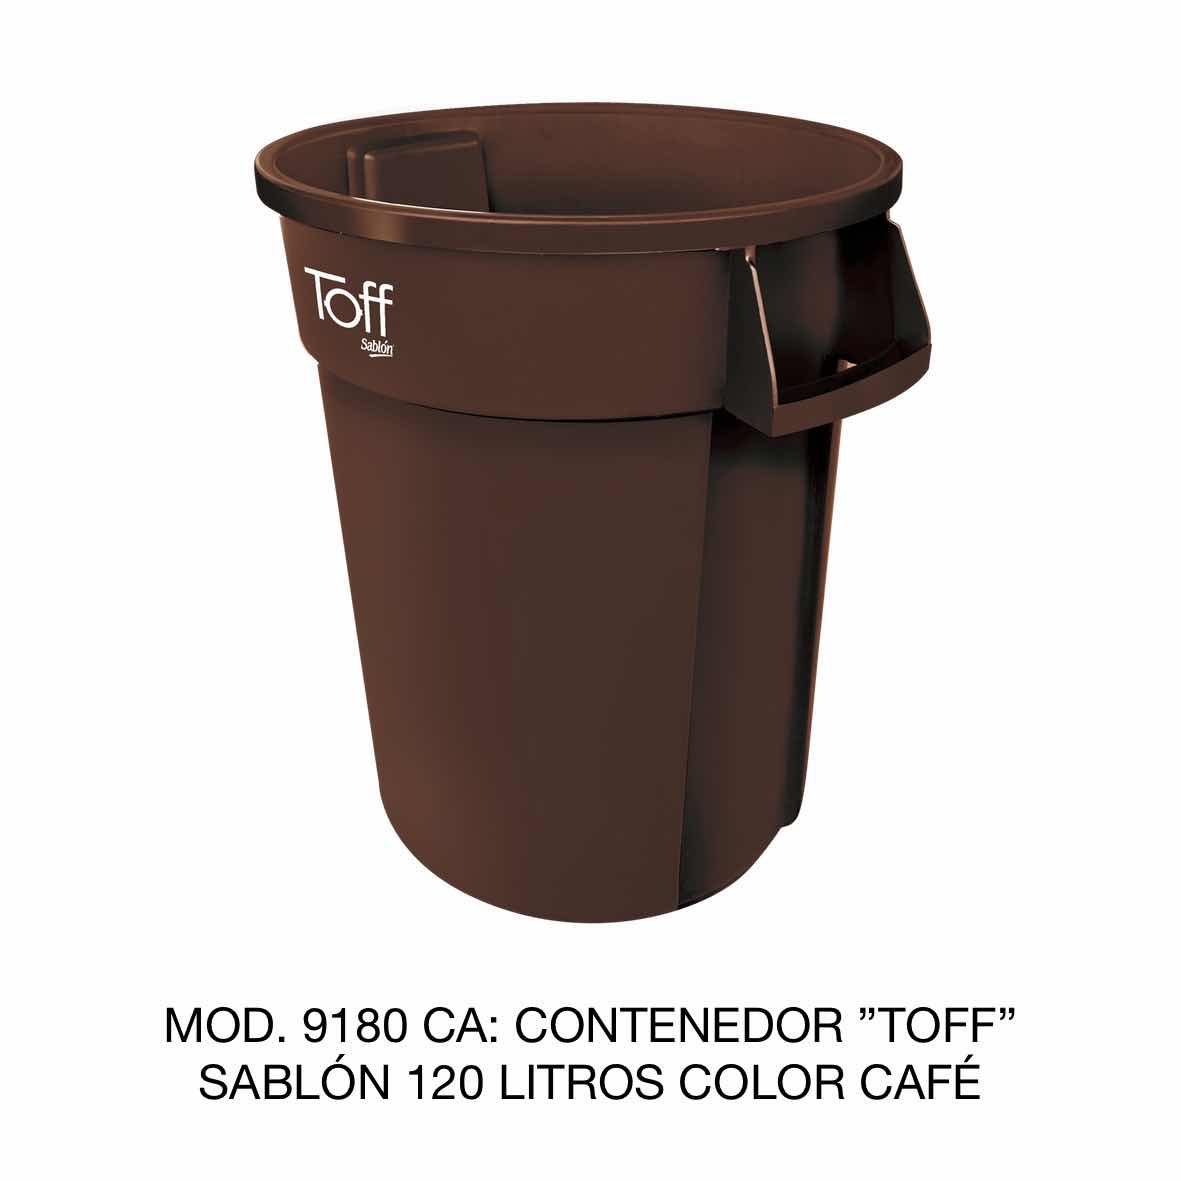 Contenedor de basura Sablón modelo TOFF de 120 litros Modelo 9180 CA Color Café